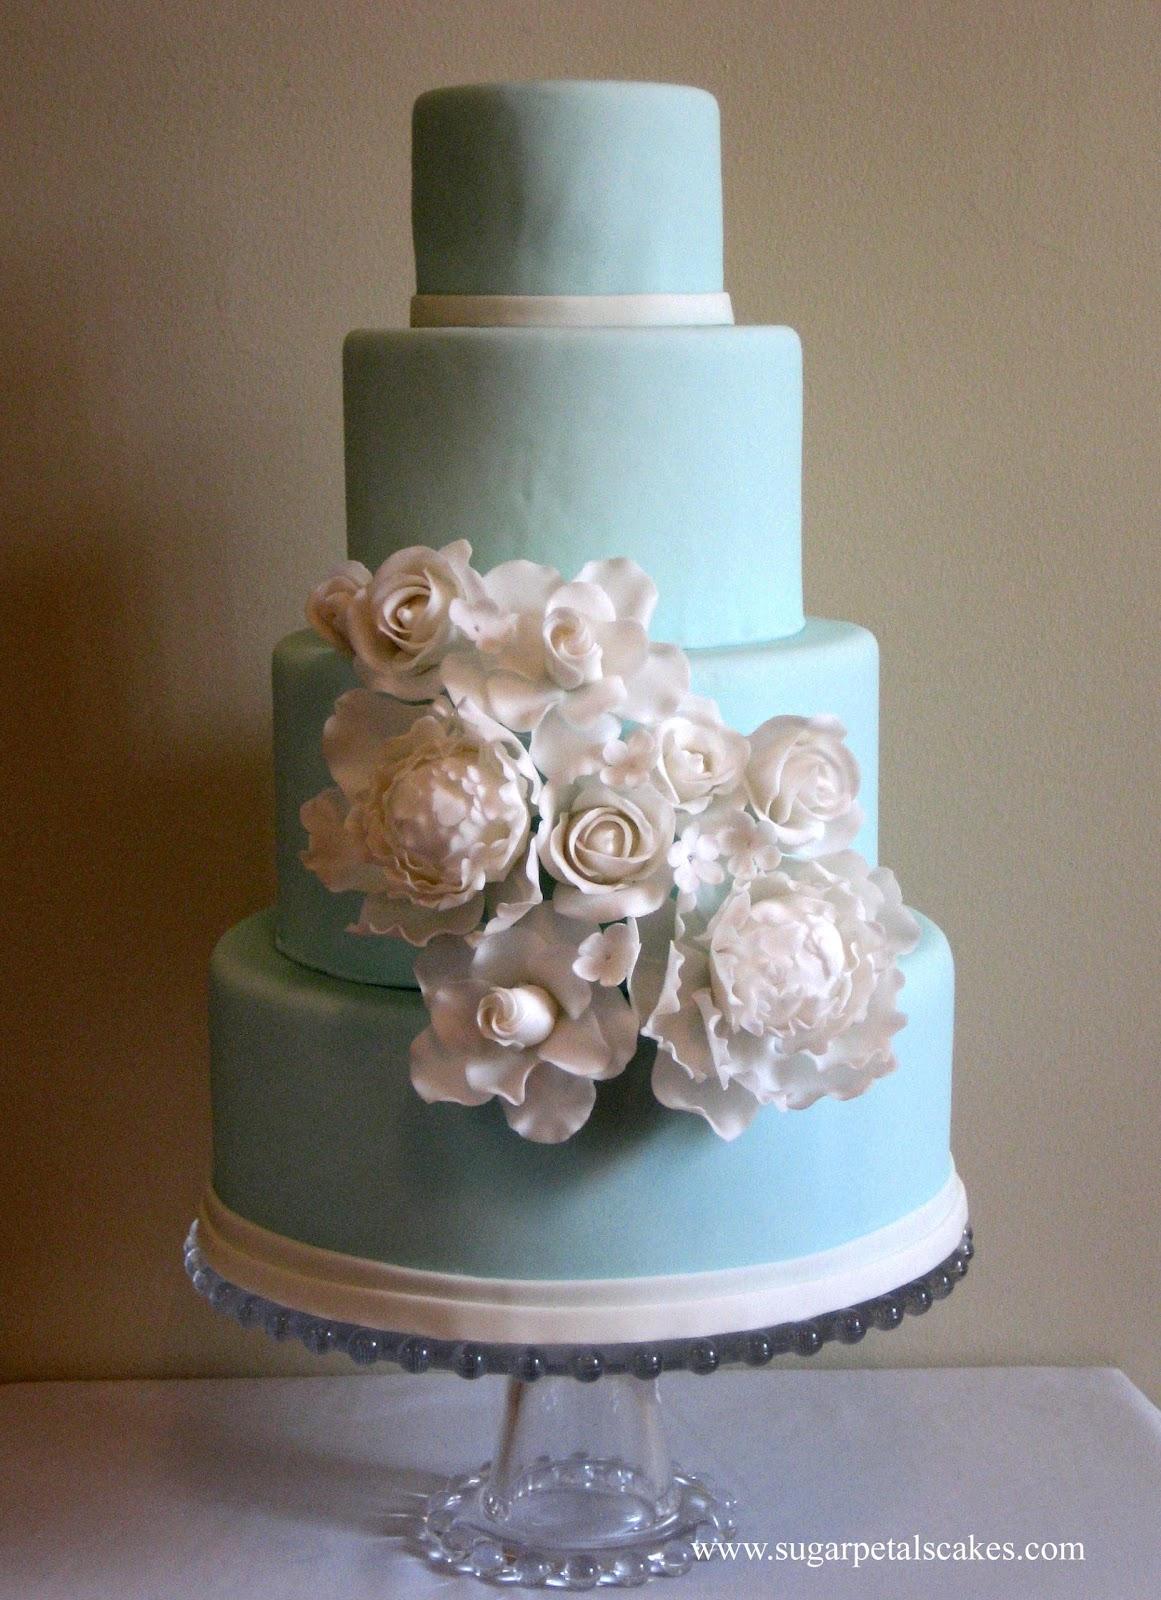 Wedding Cake Photo of the